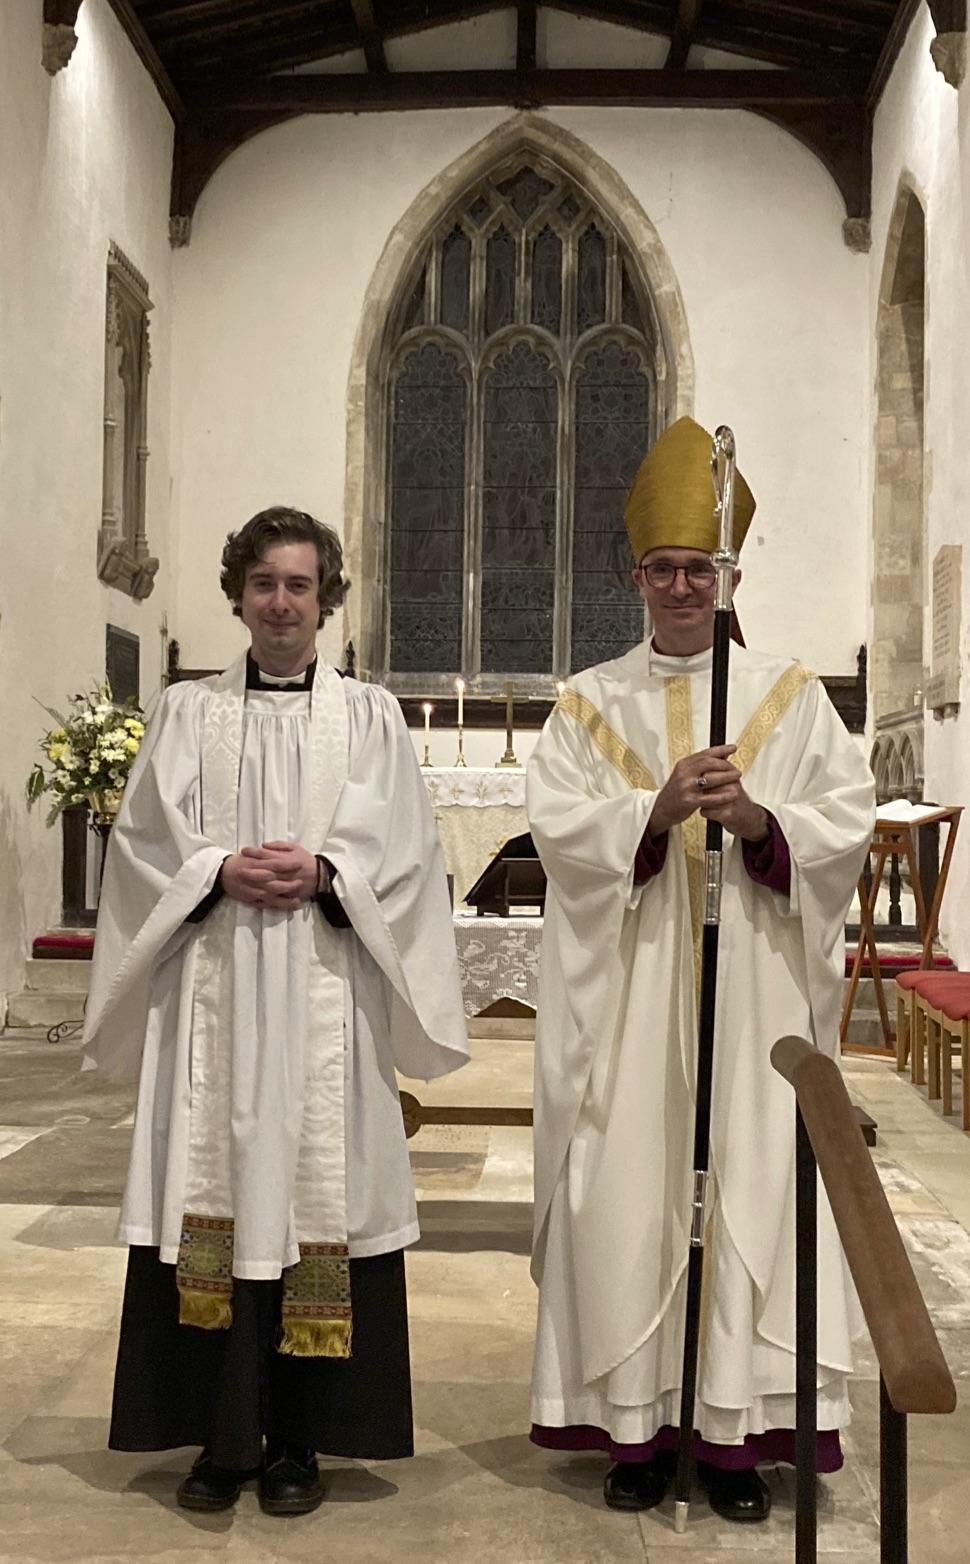 Revd Aron and Bishop Nicholas